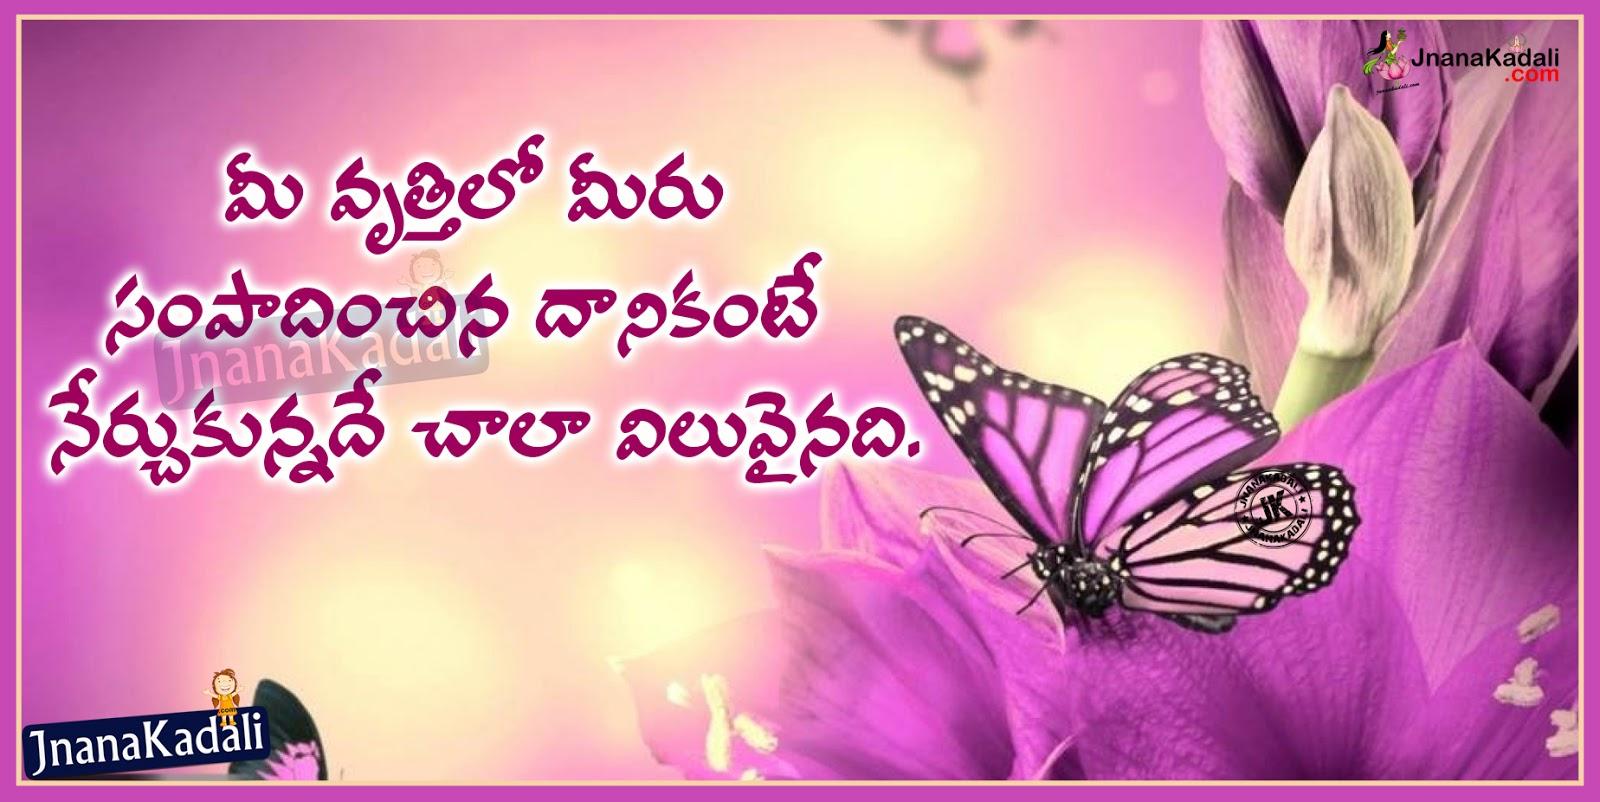 Best Telugu Good Night Greetings With Telugu Quotes Jnana Kadali